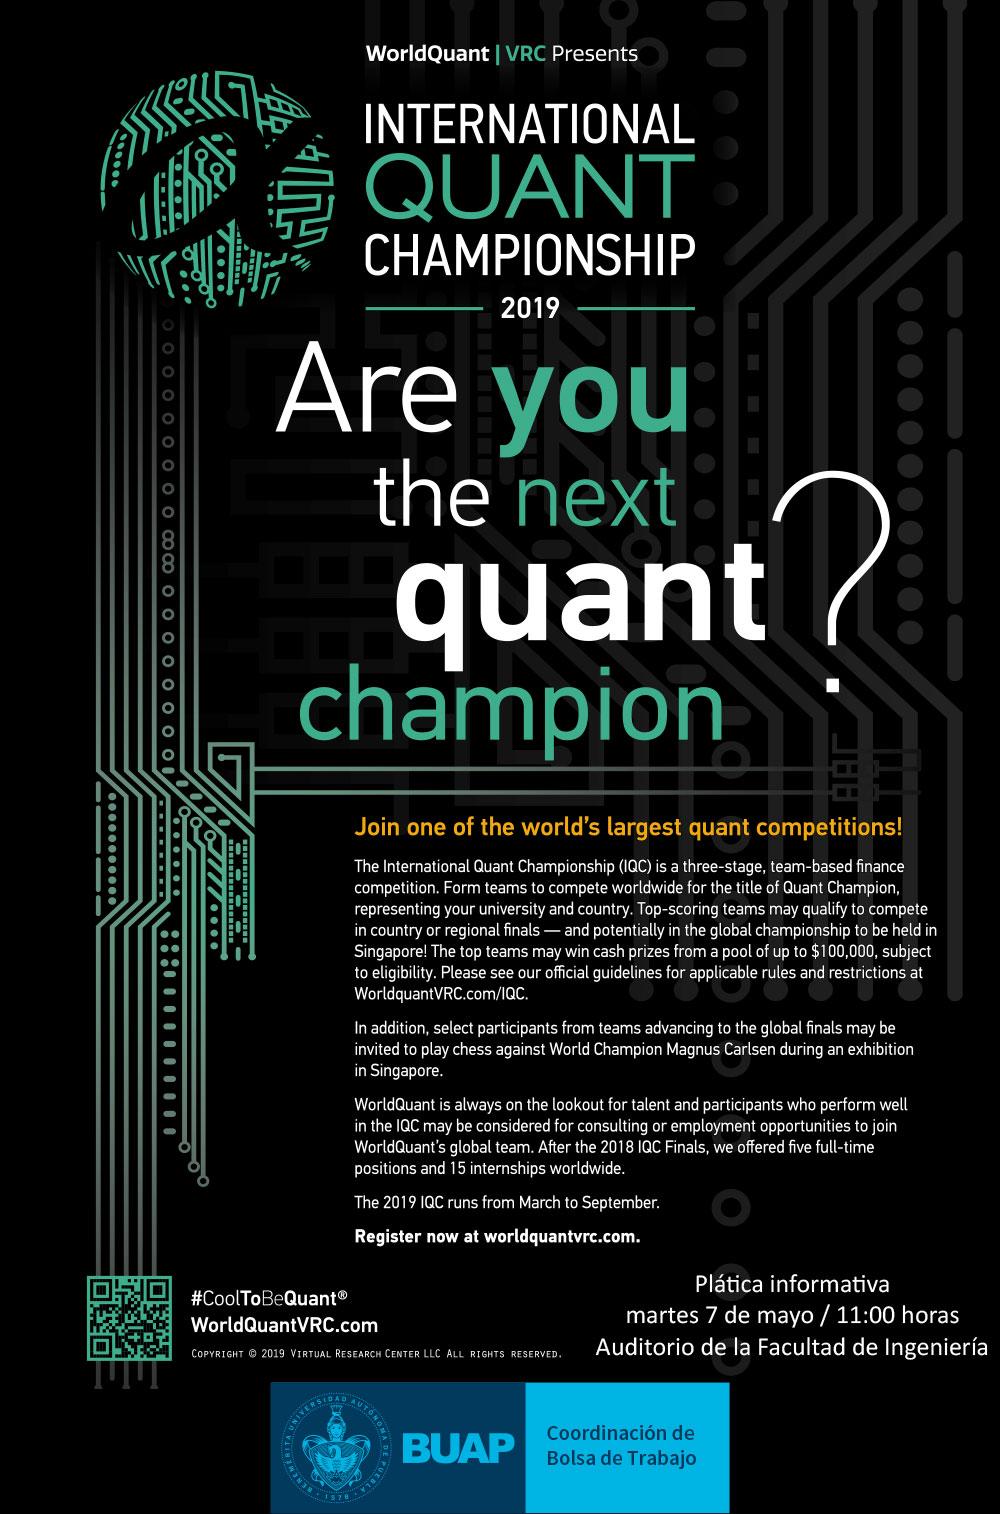 You The Quant Universidad Are Next ChampionBenemérita 0nX8wOPk